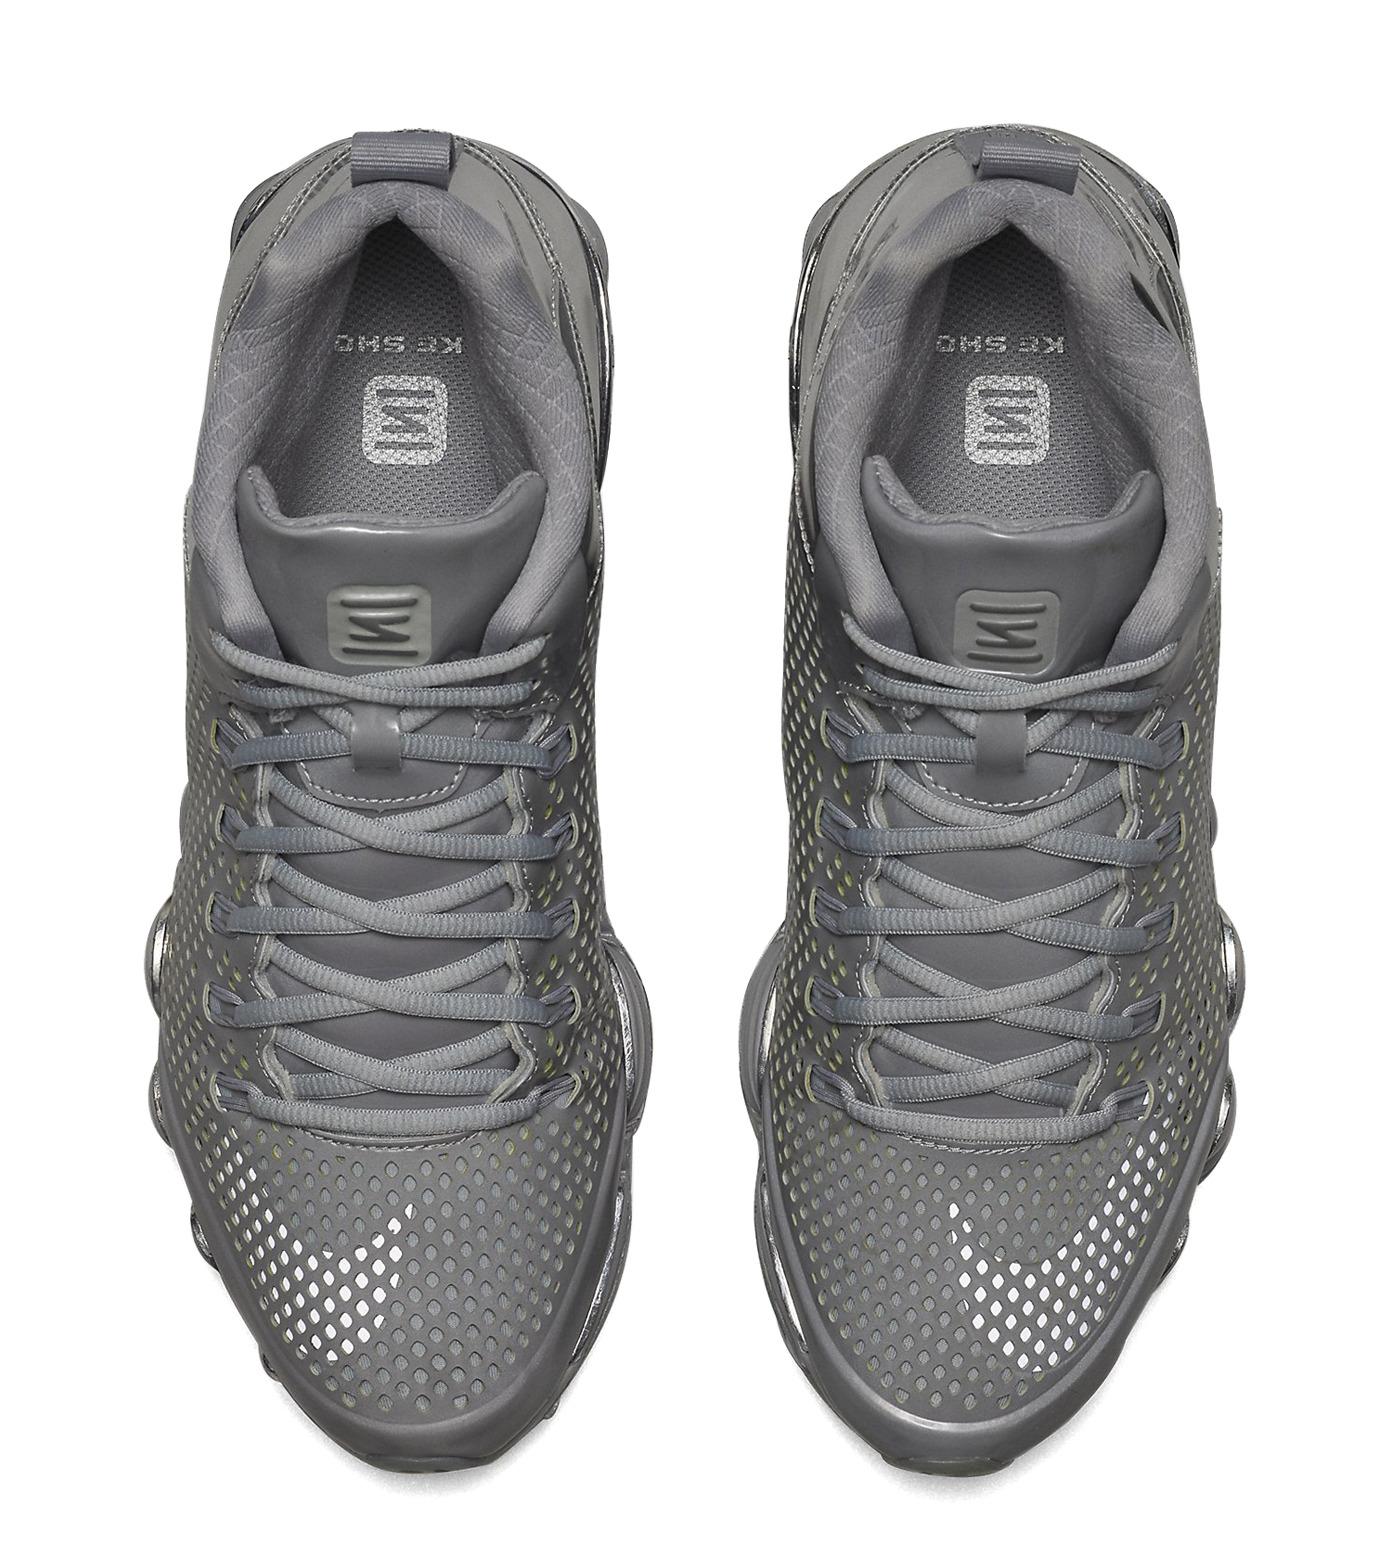 NIKE(ナイキ)のSHOX TLX MID SP-SILVER(シューズ/shoes)-677737-003-1 拡大詳細画像4